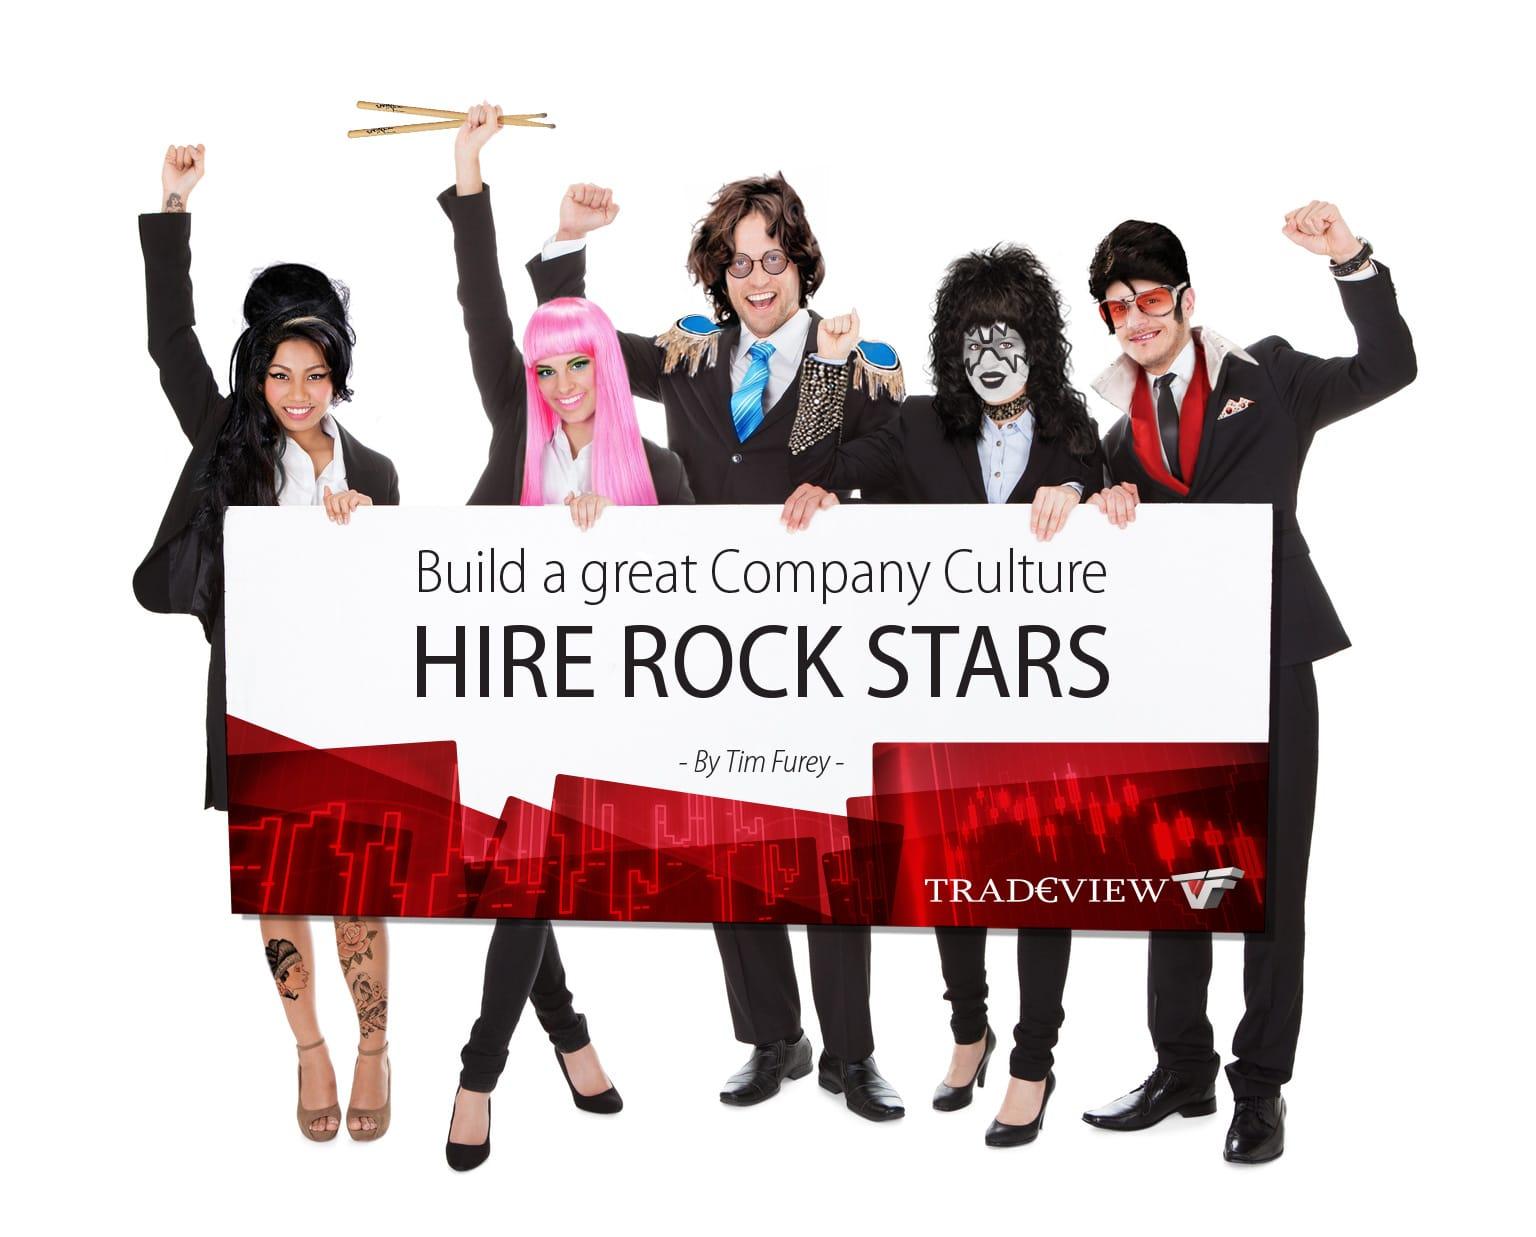 Build A Great Company Culture – Hire ROCK STARS